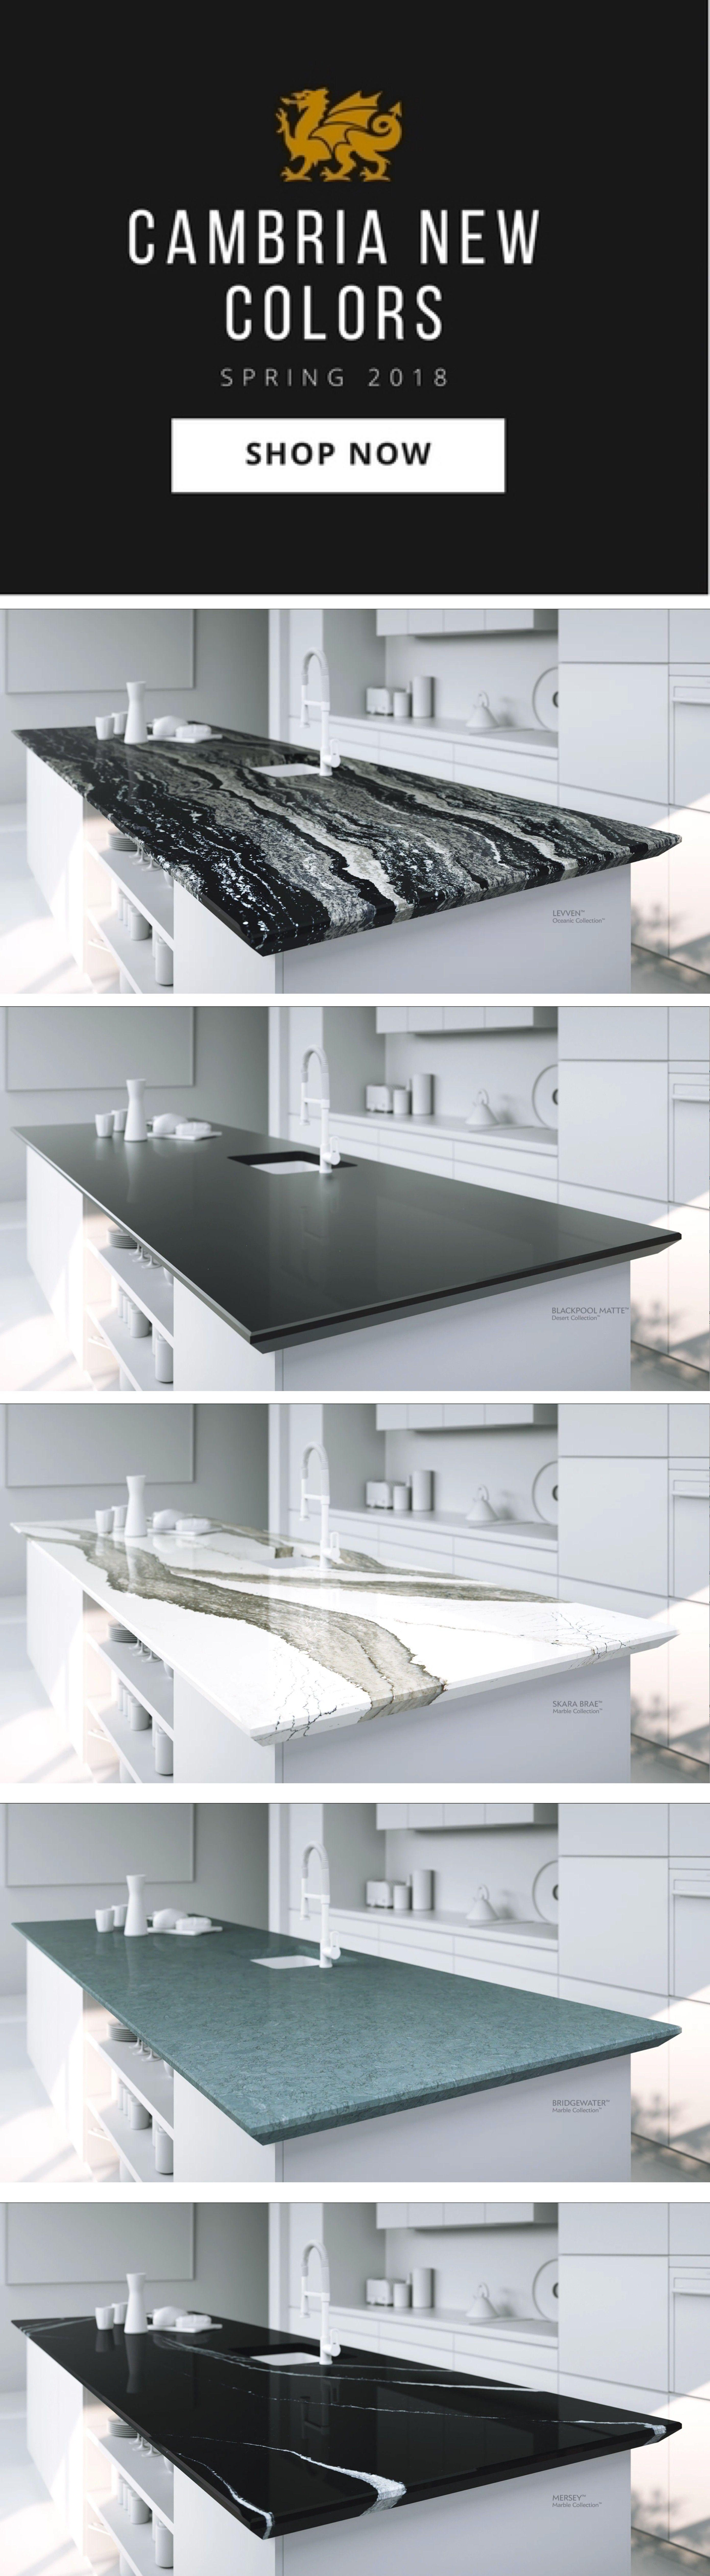 pin tampa quartz pinterest eternal silestone countertops kitchen gold calacatta